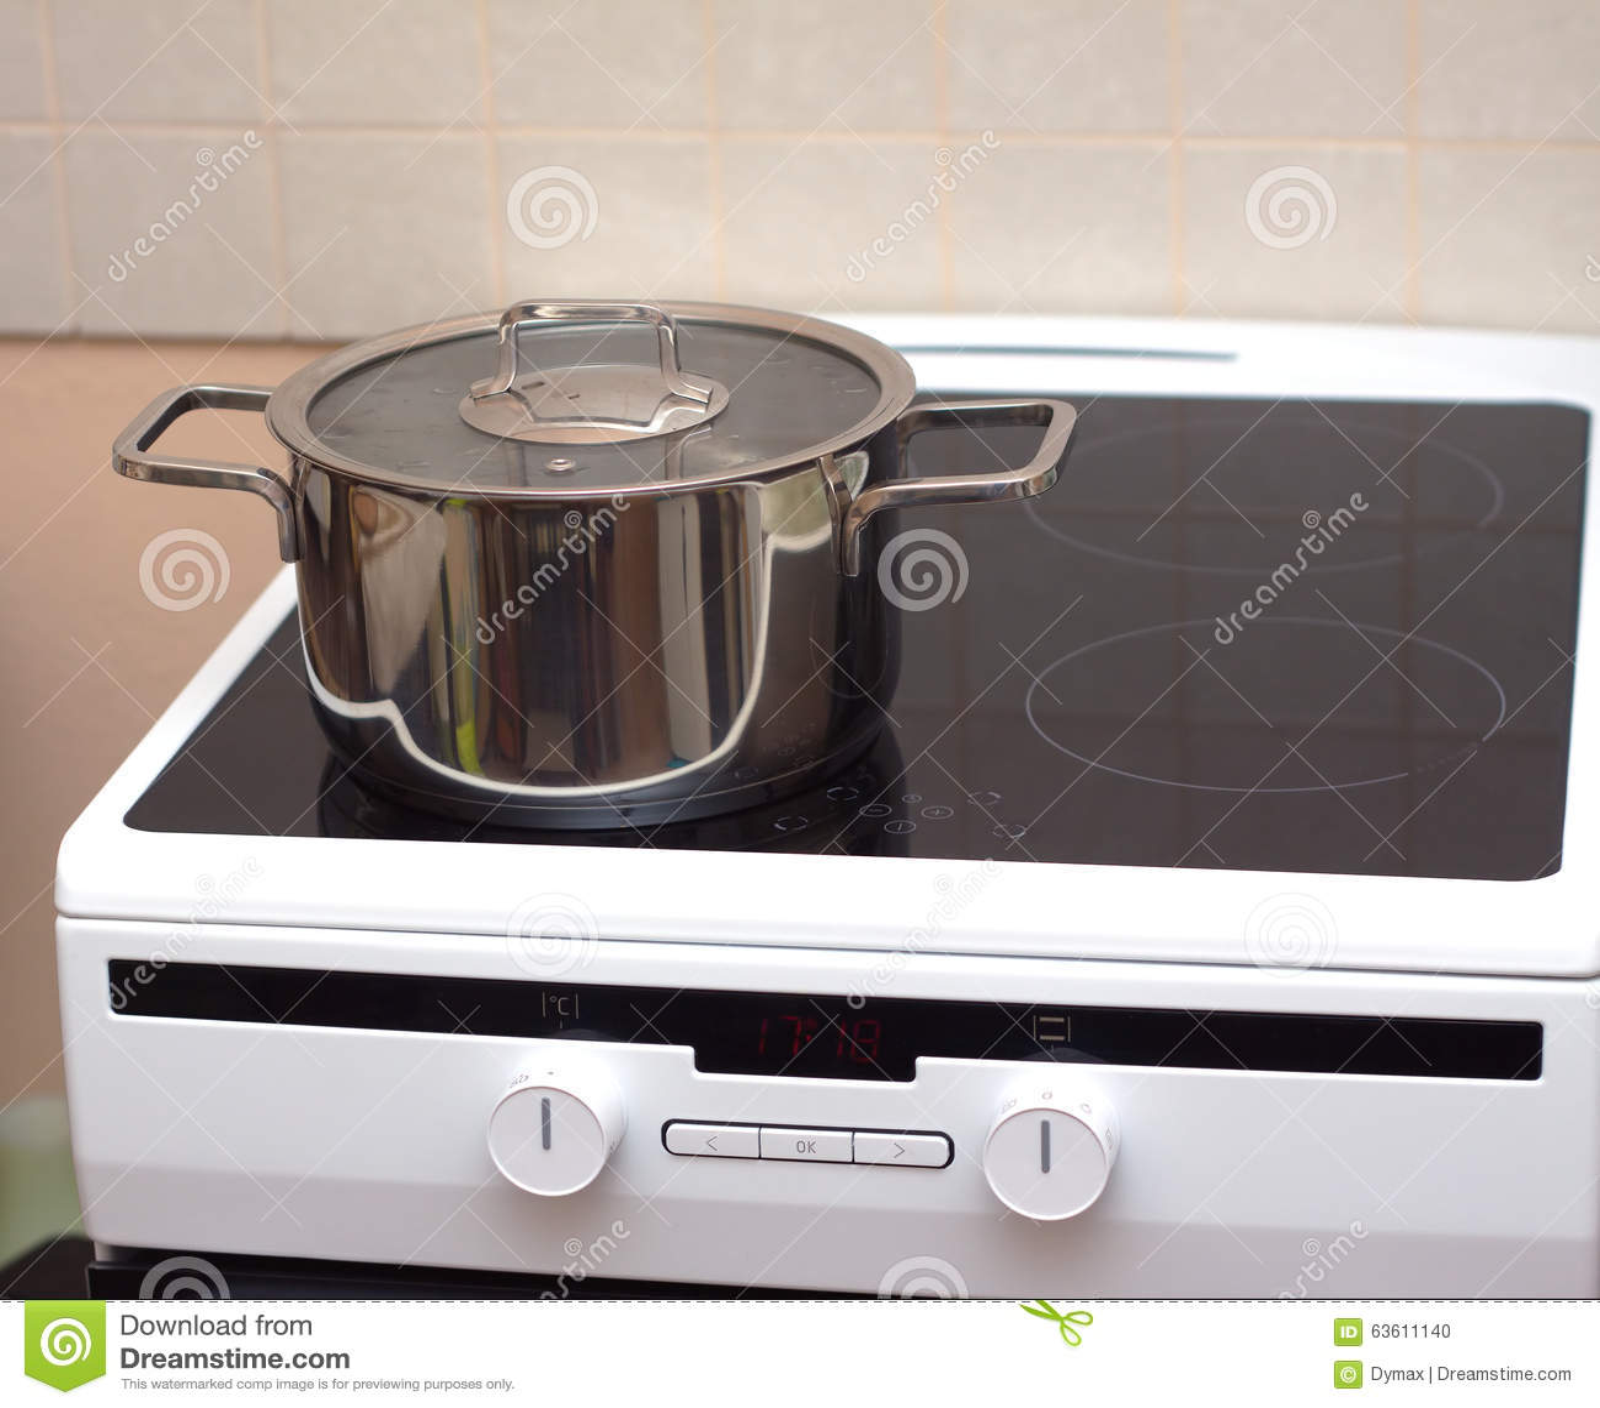 Metal Steel Saucepan On Modern Kitchen Electric Stove